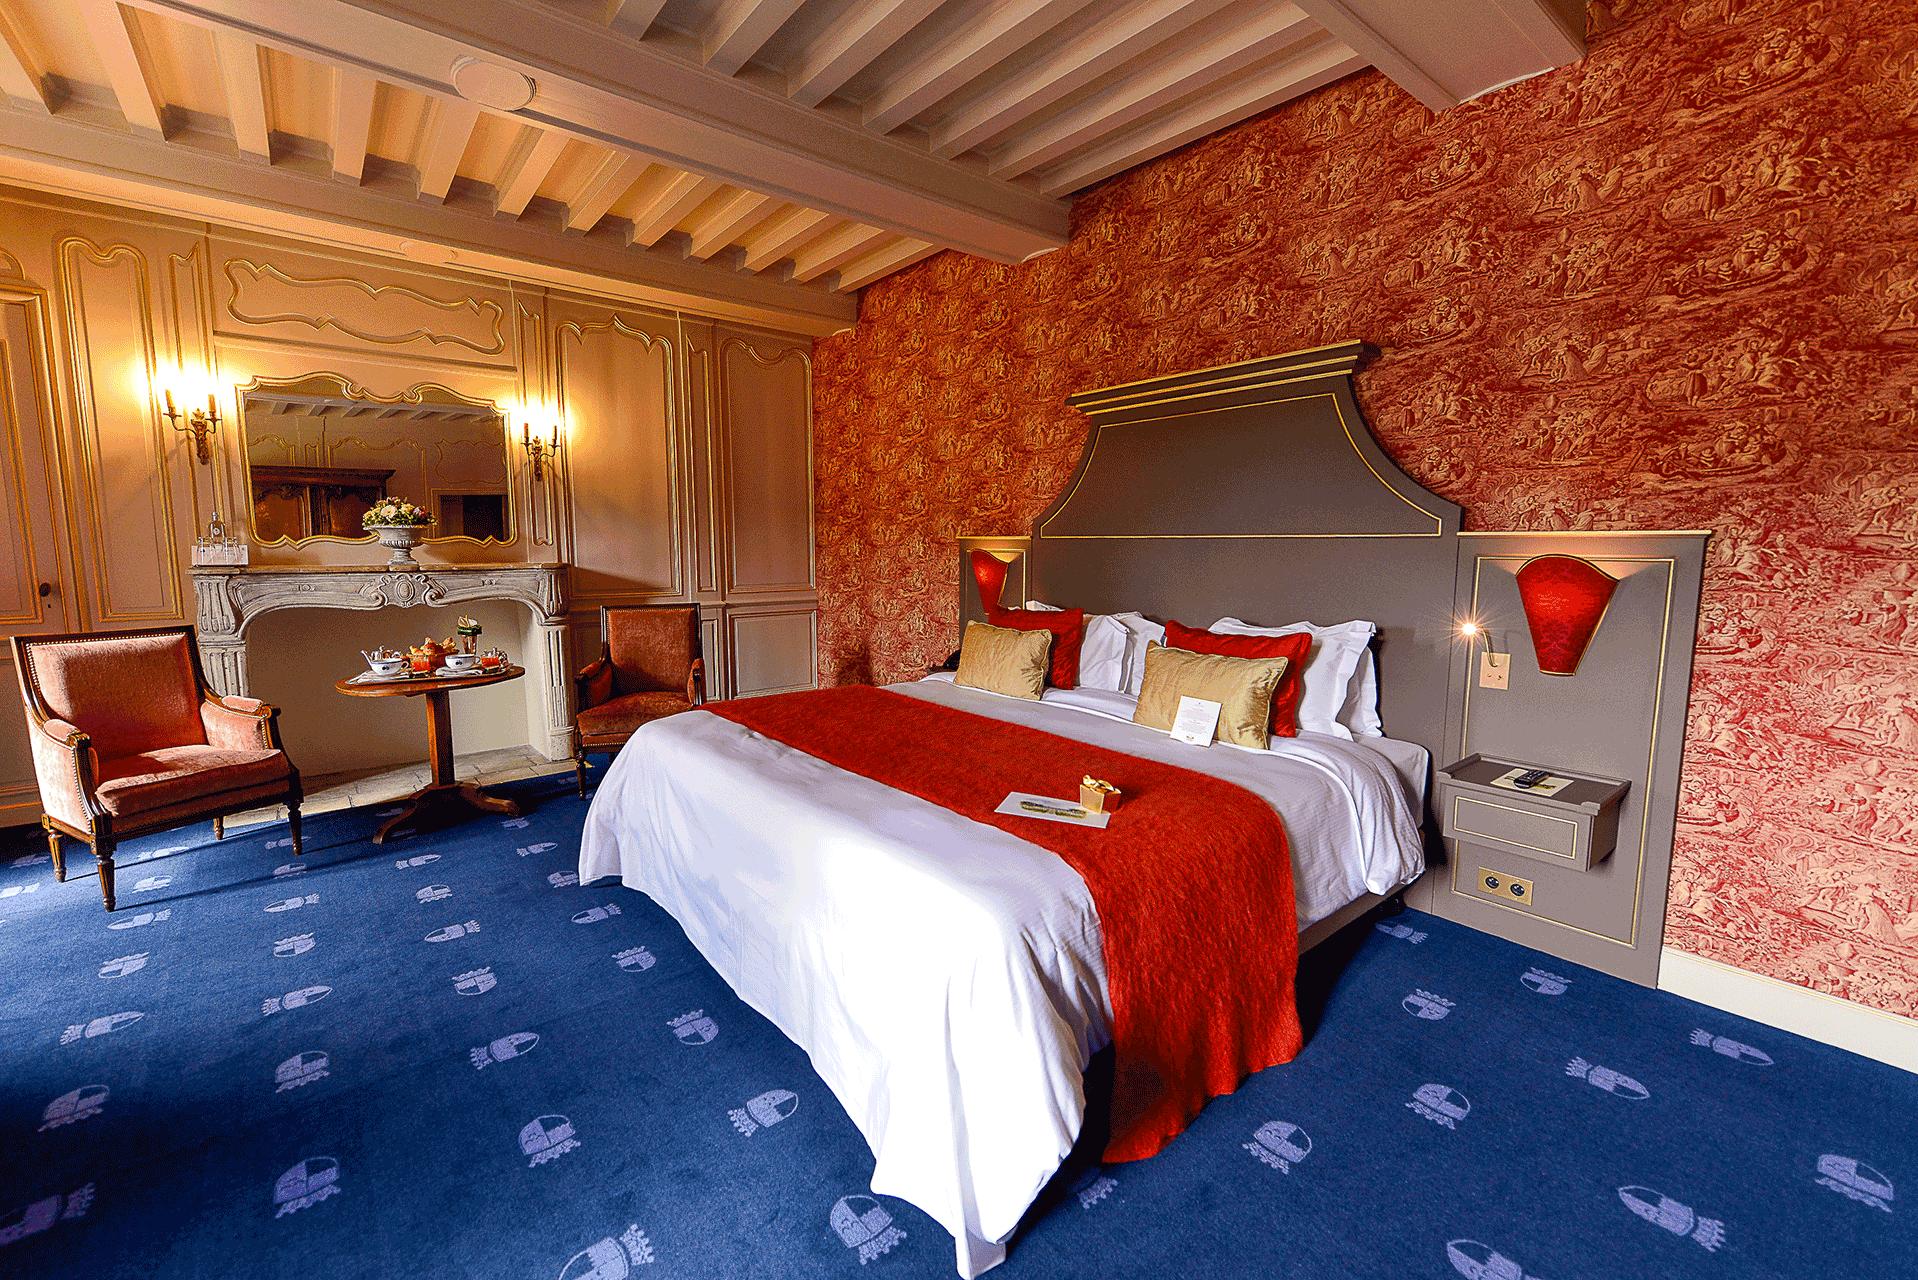 maya-angelsen-photo-essonne-resort-chateau-audrieu